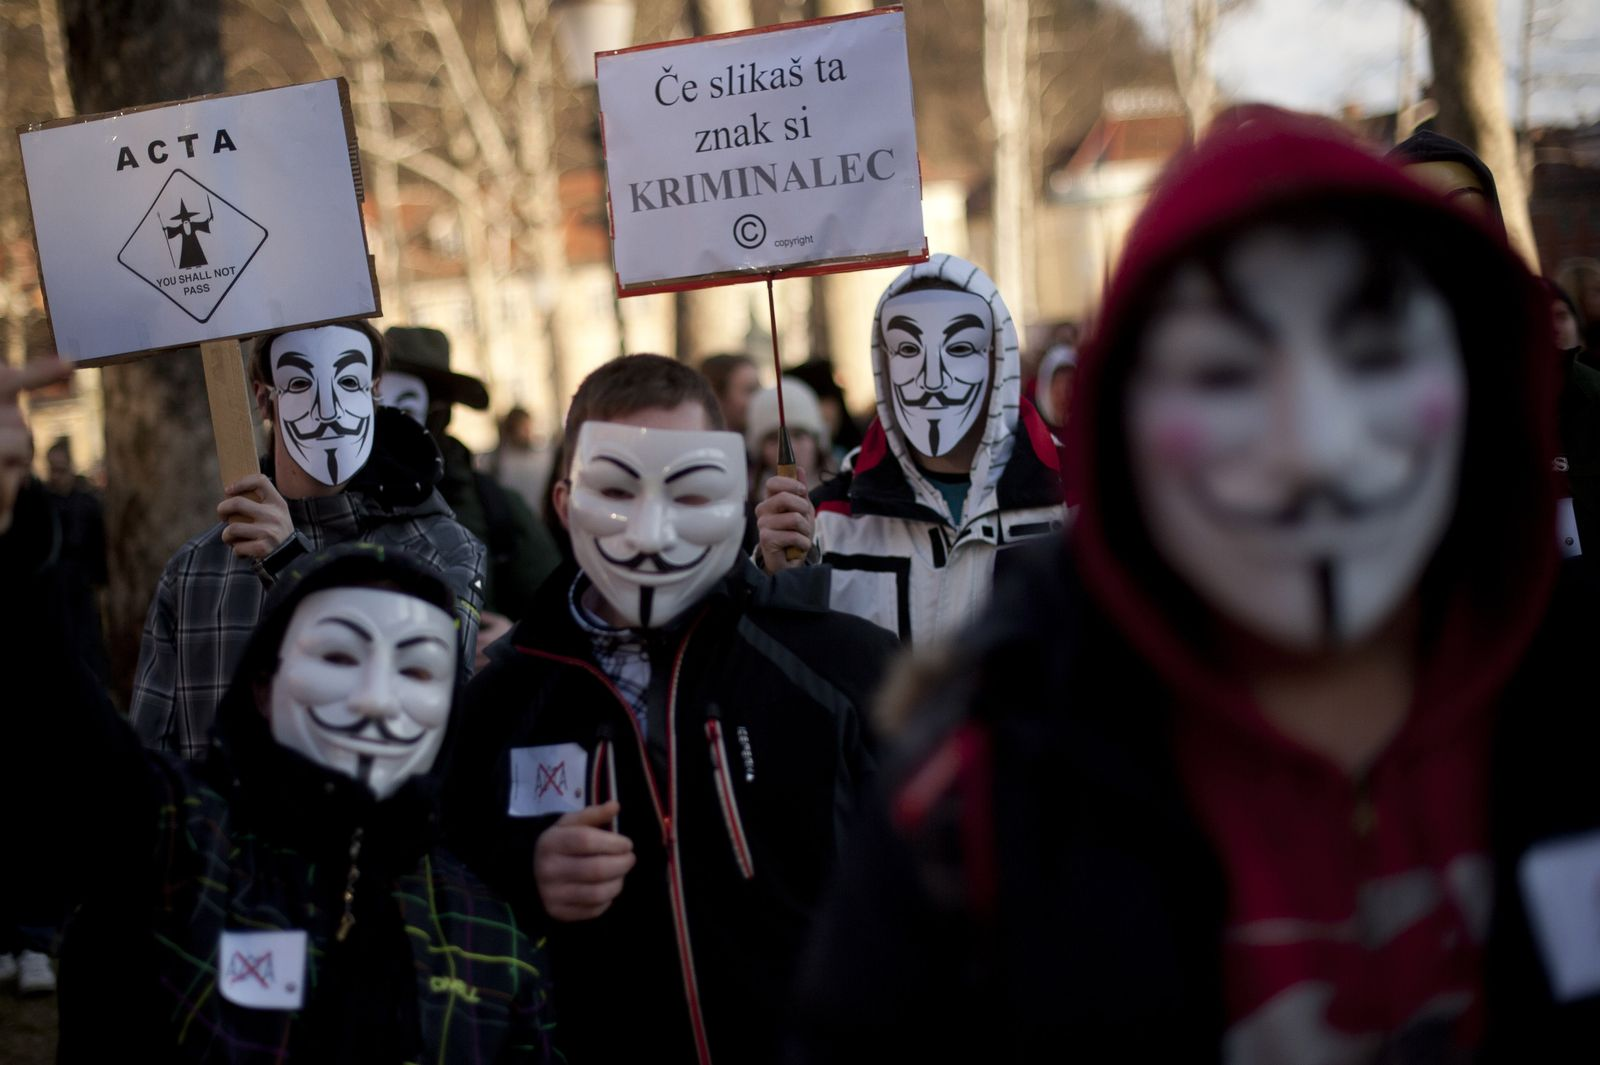 Slovenia Internet ACTA